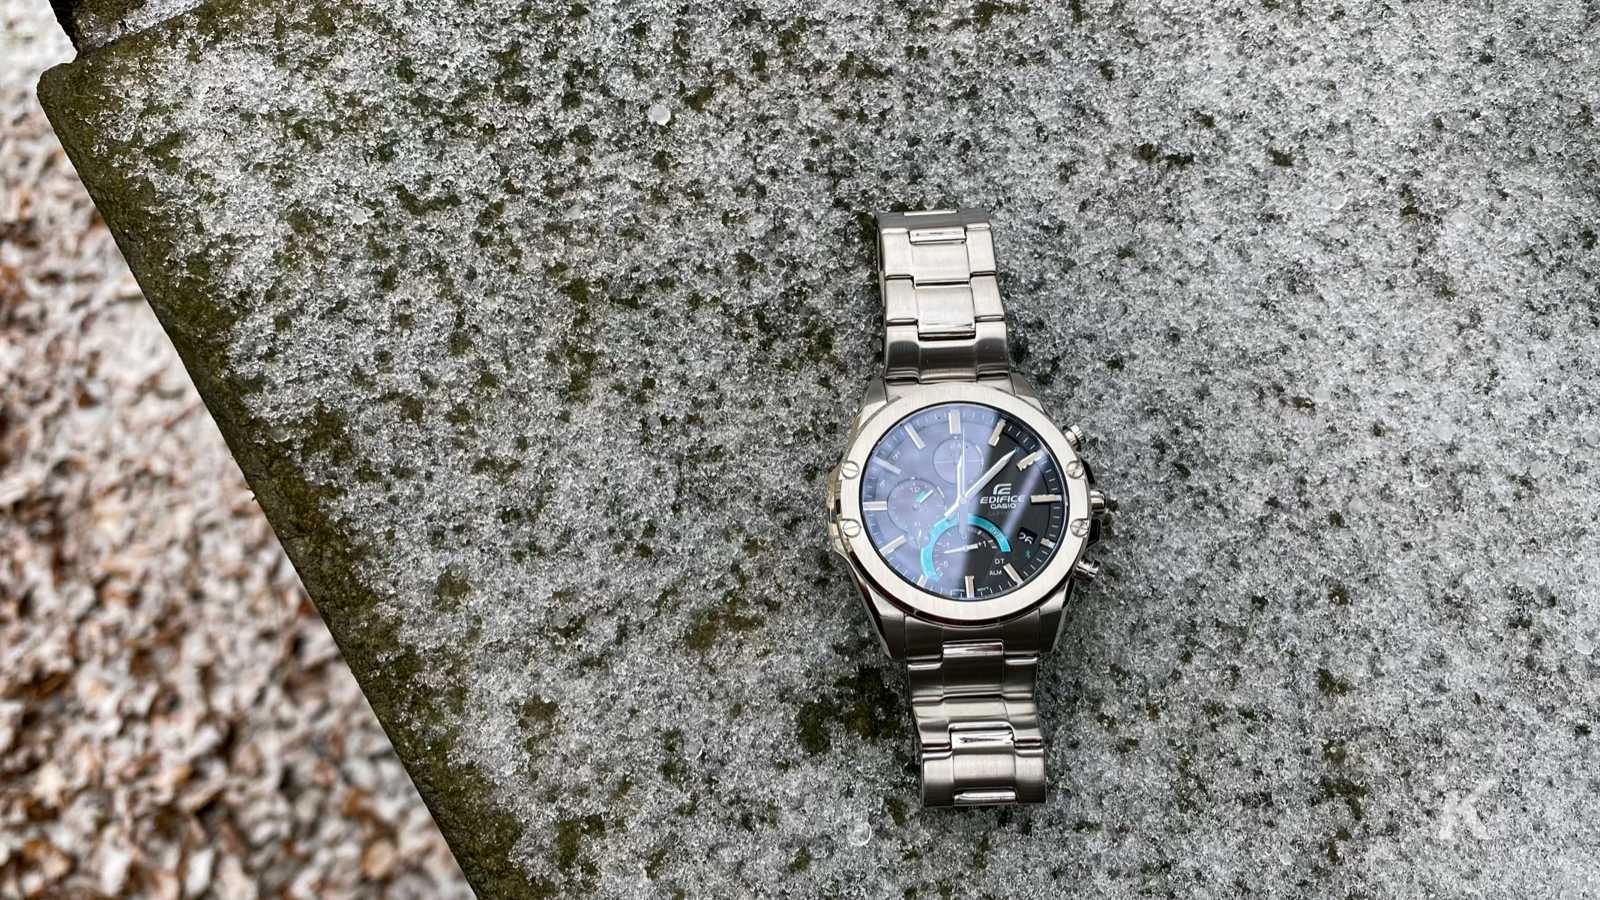 casio edifice eqb-1000d connected watch on snowy brick